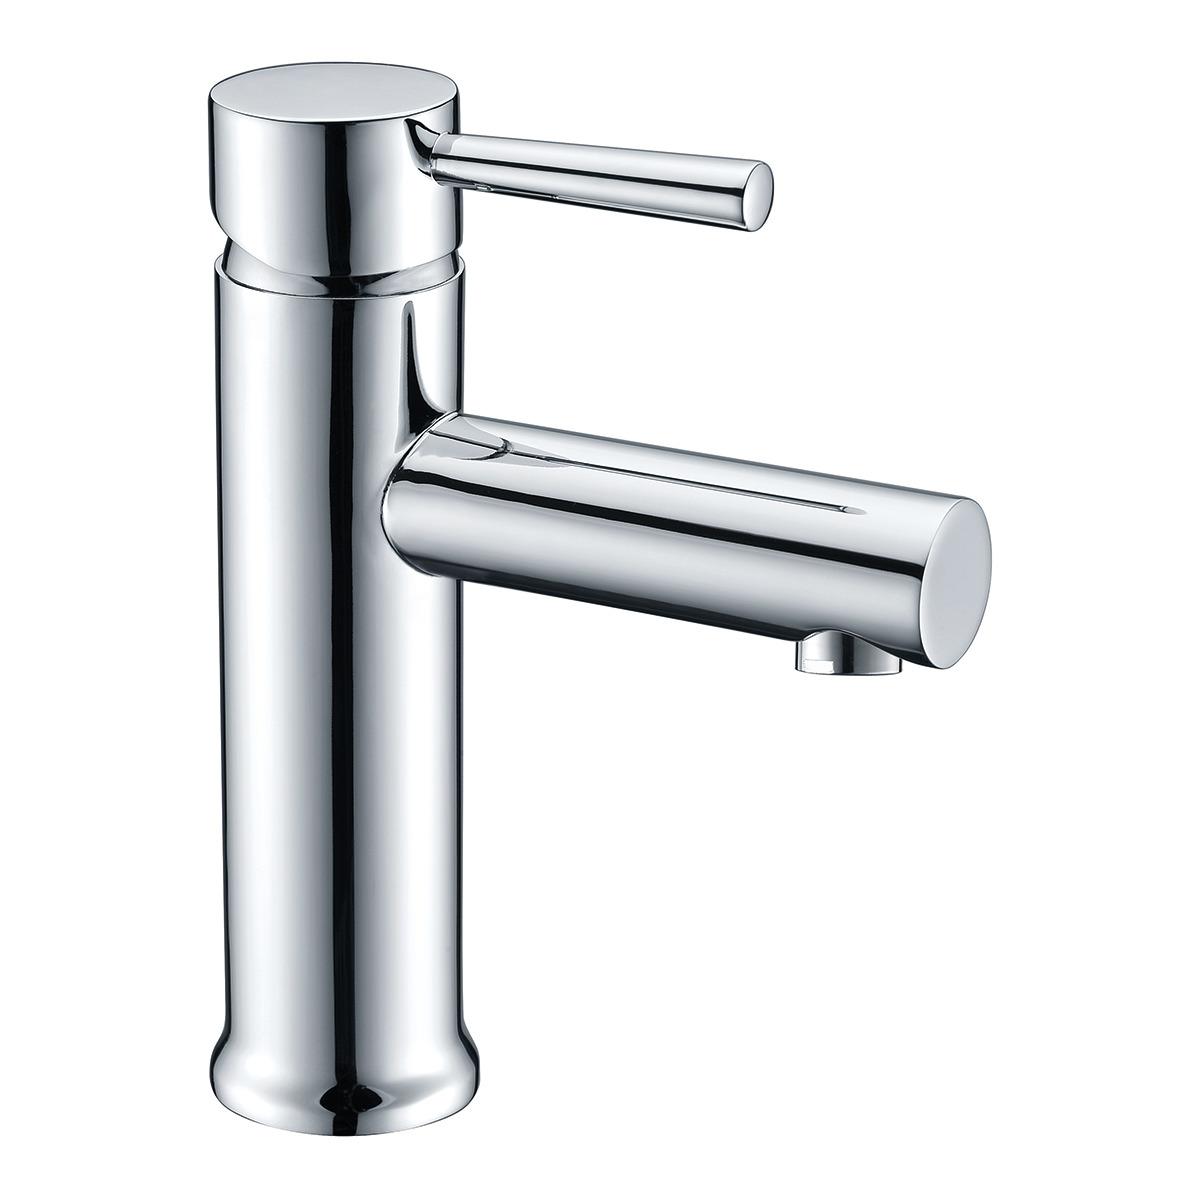 Grifo monomando para lavabo Milan Imex